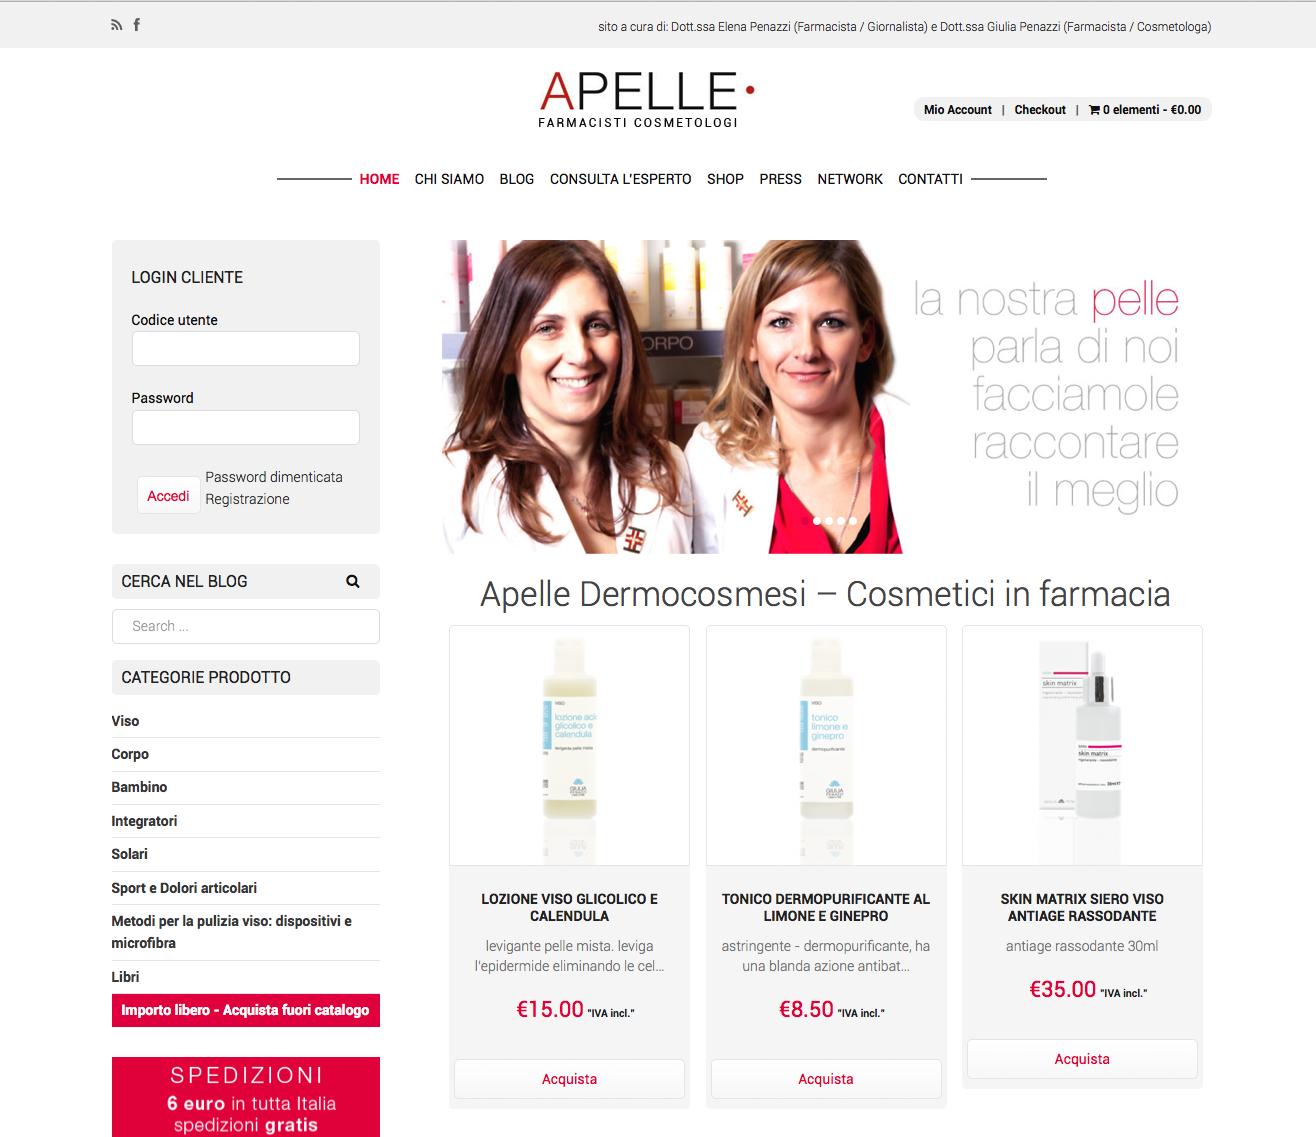 sito apelle.it